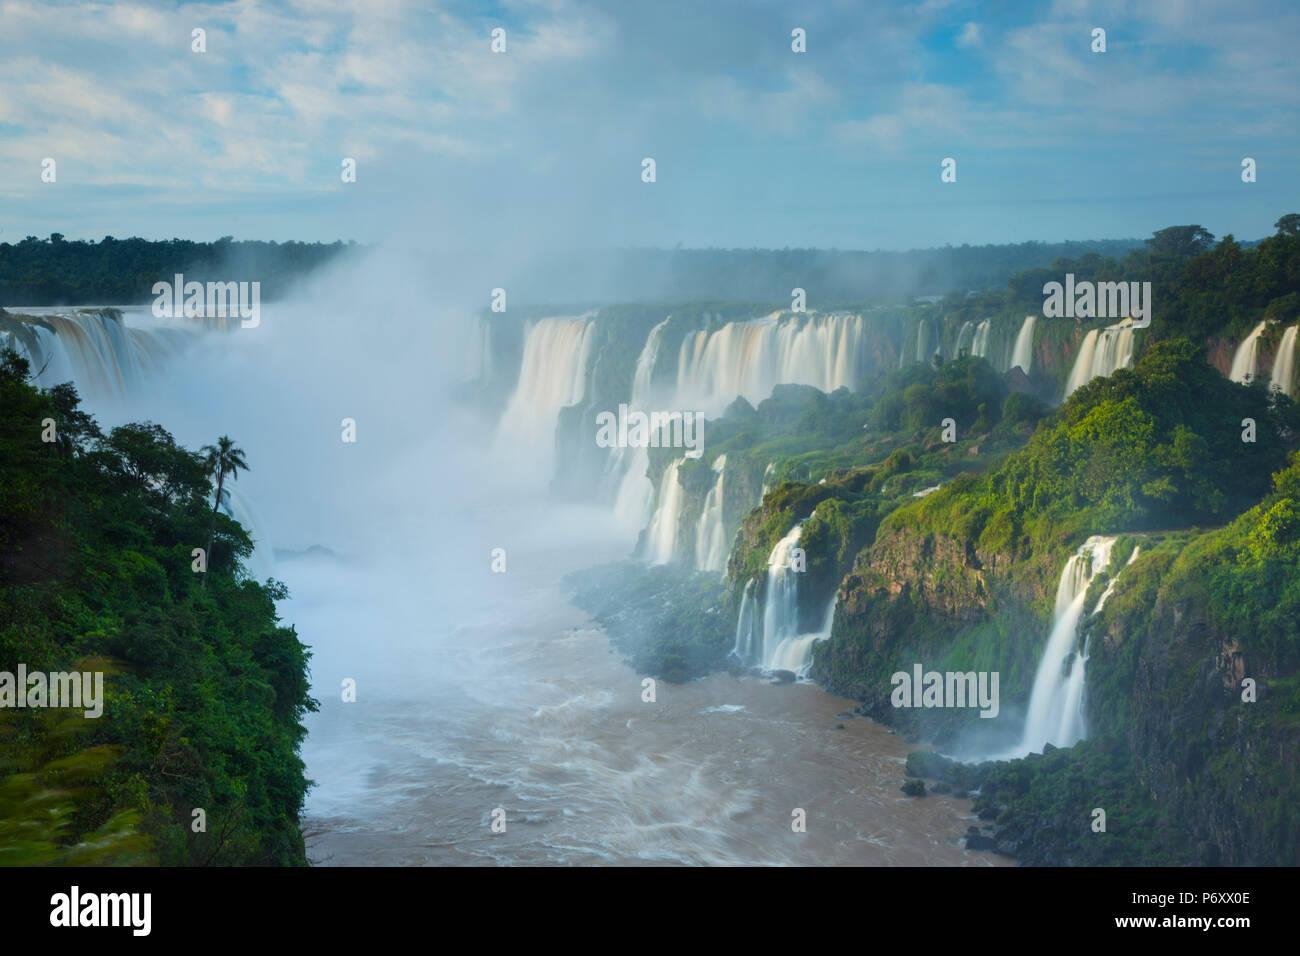 Iguacu Falls, Parana State, Brazil - Stock Image